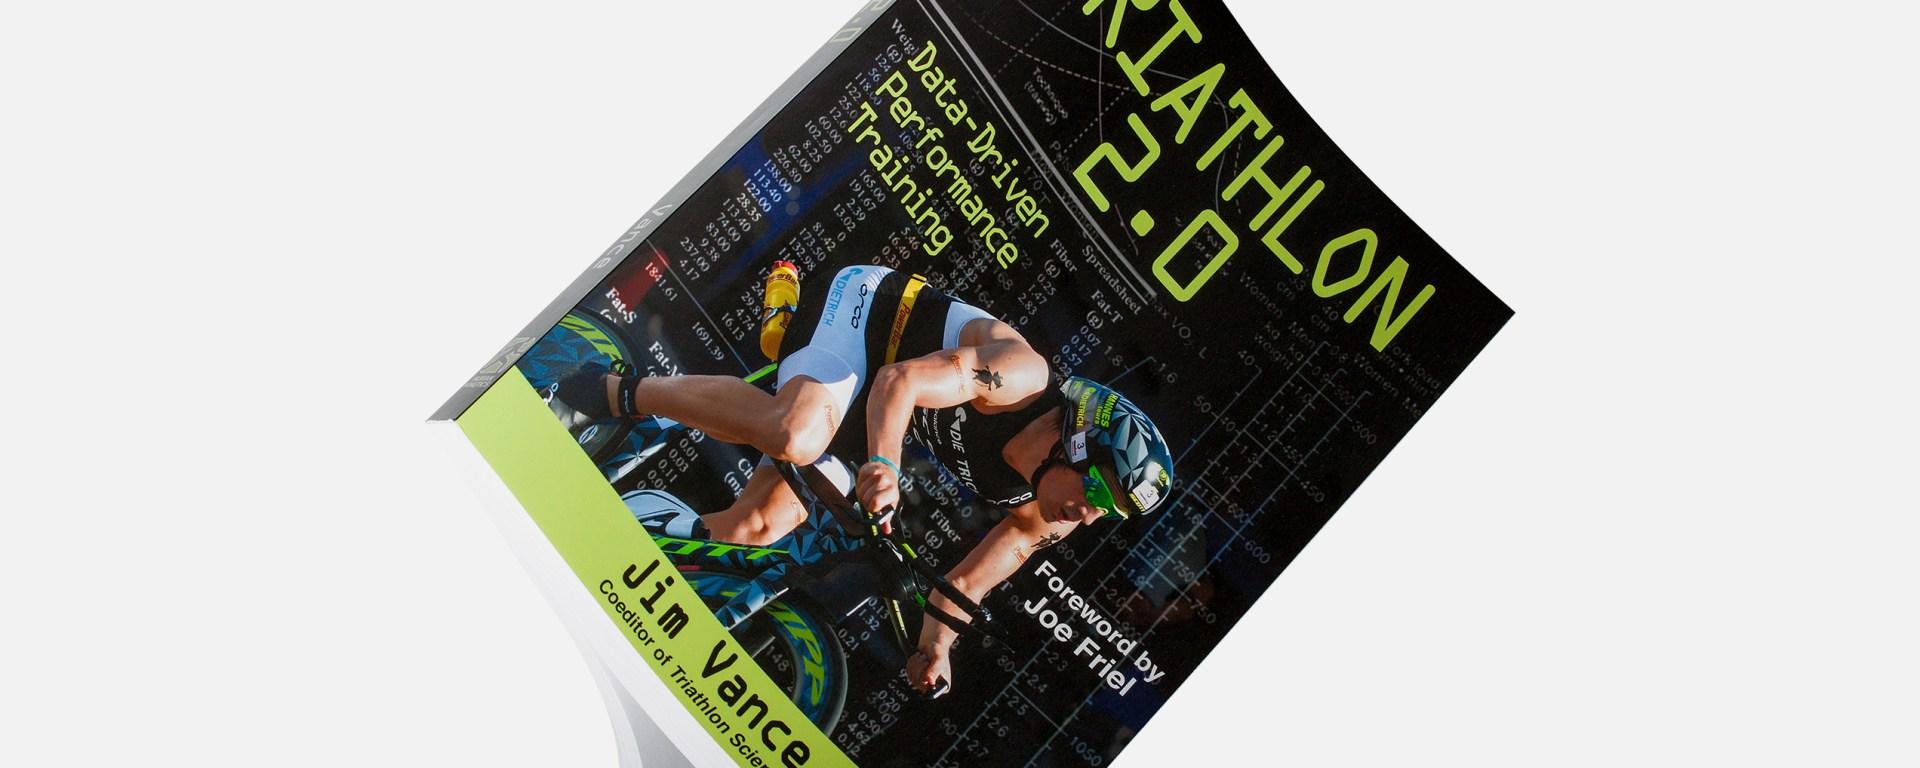 Triathlon 2.0